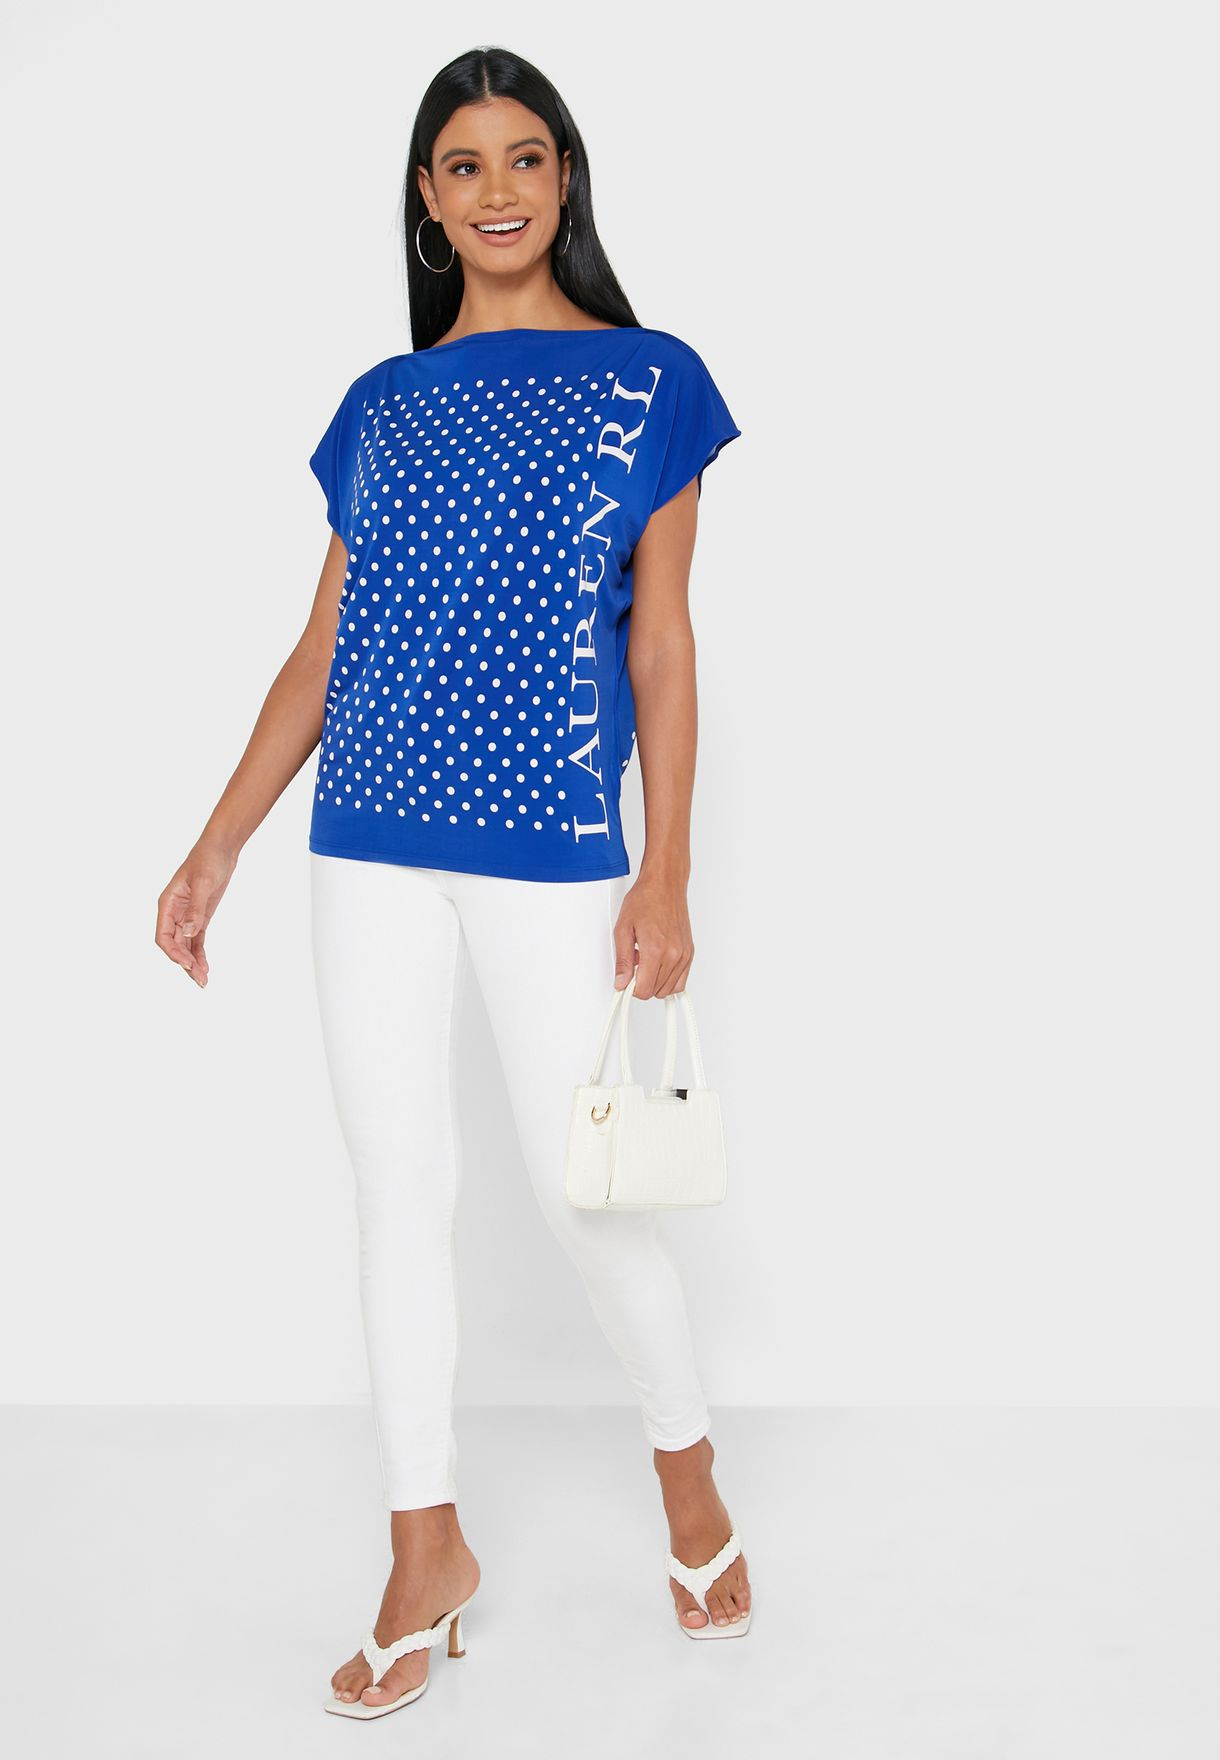 Polka Dot Knitted Top